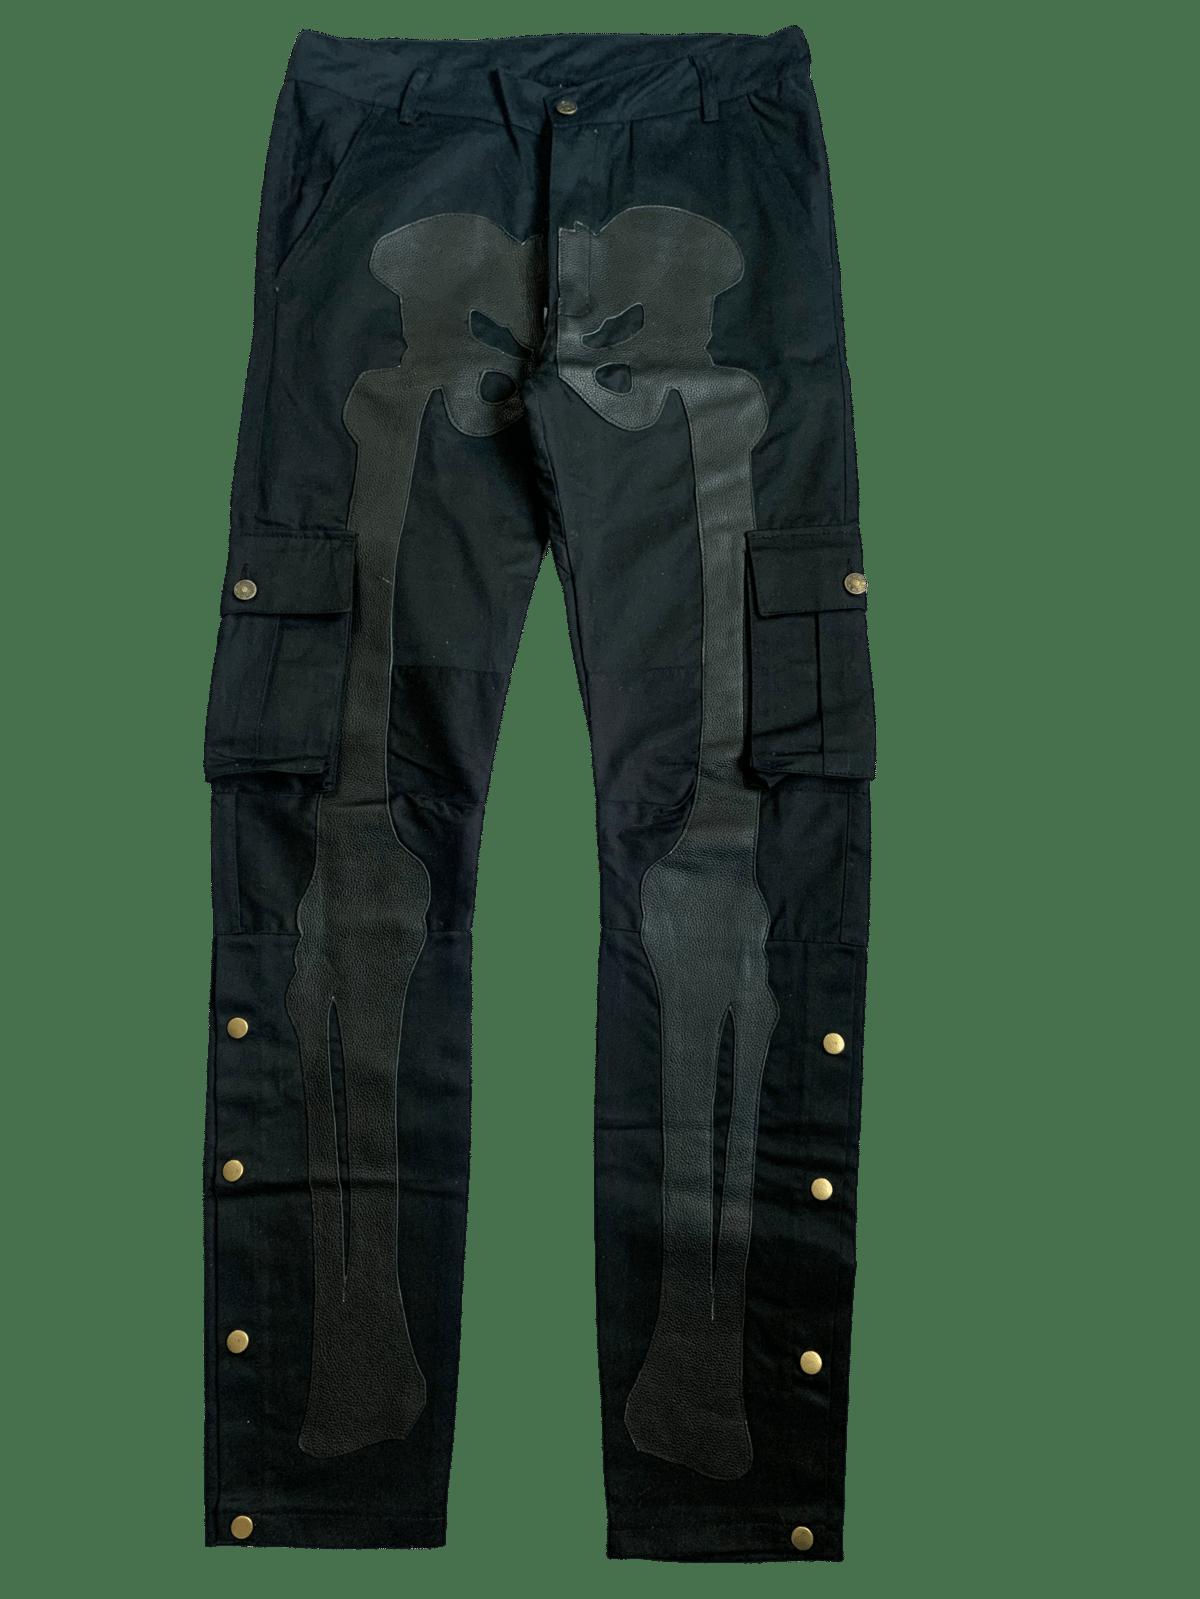 Image of MIDNIGHT BLACK SNAP CARGO BONE PANTS